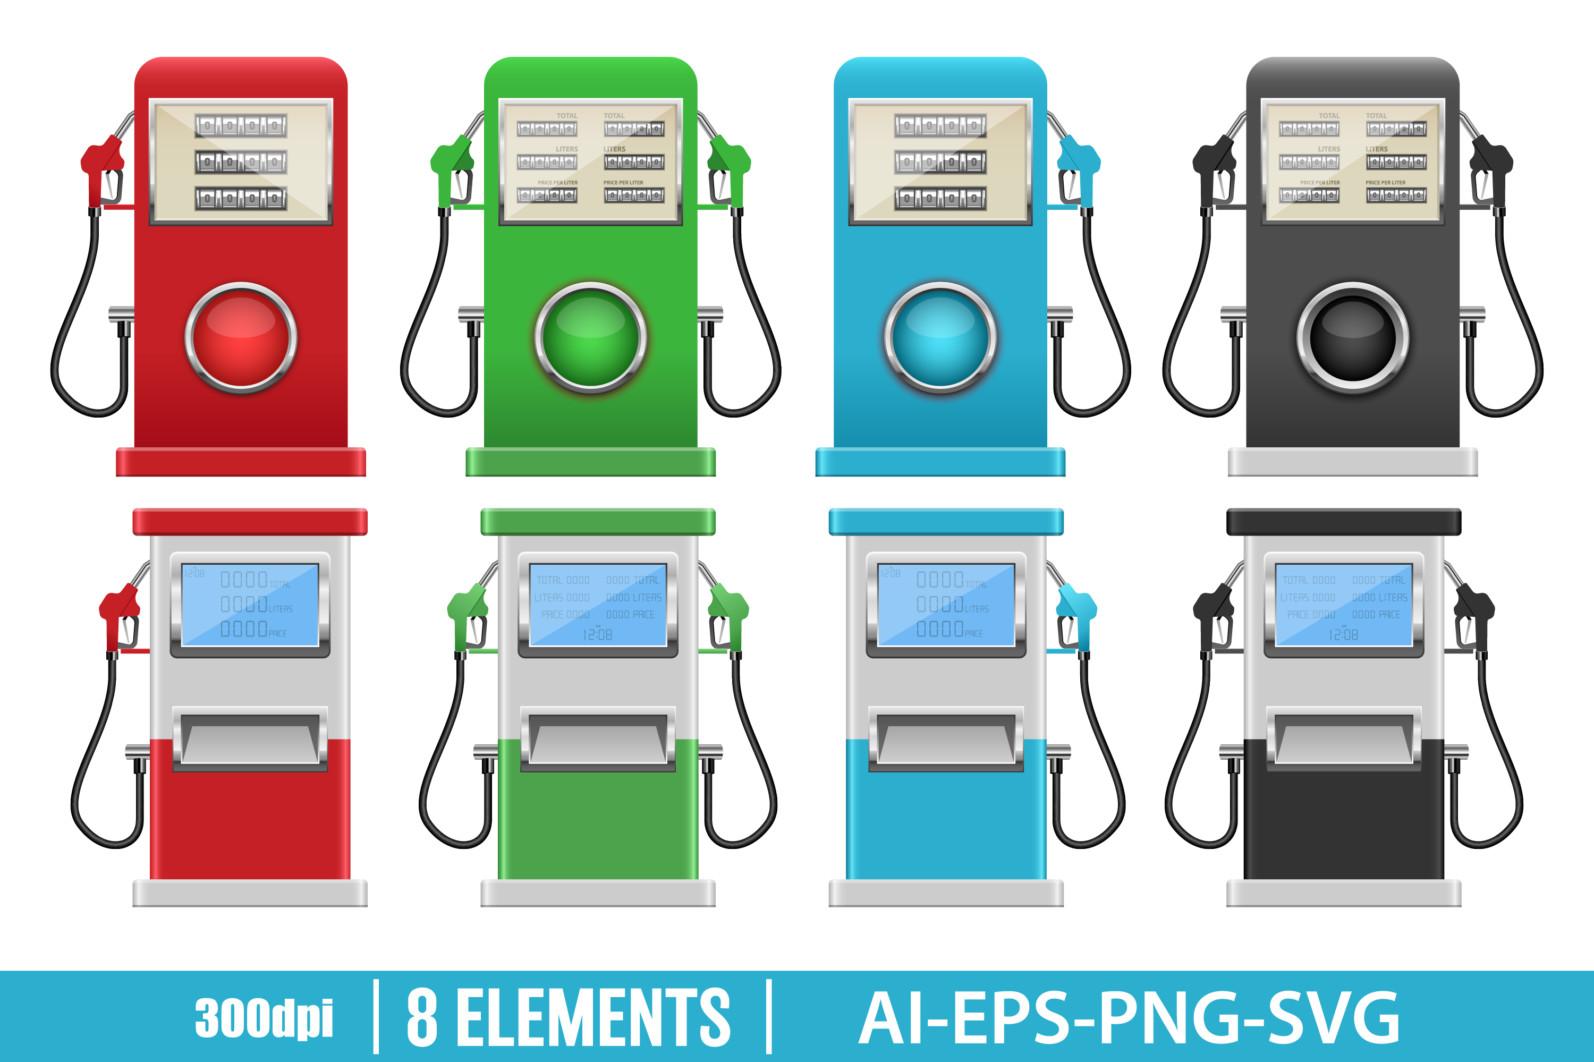 Gas pump clipart vector design illustration. Gas pump set. Vector Clipart Print - GAS STATION scaled -